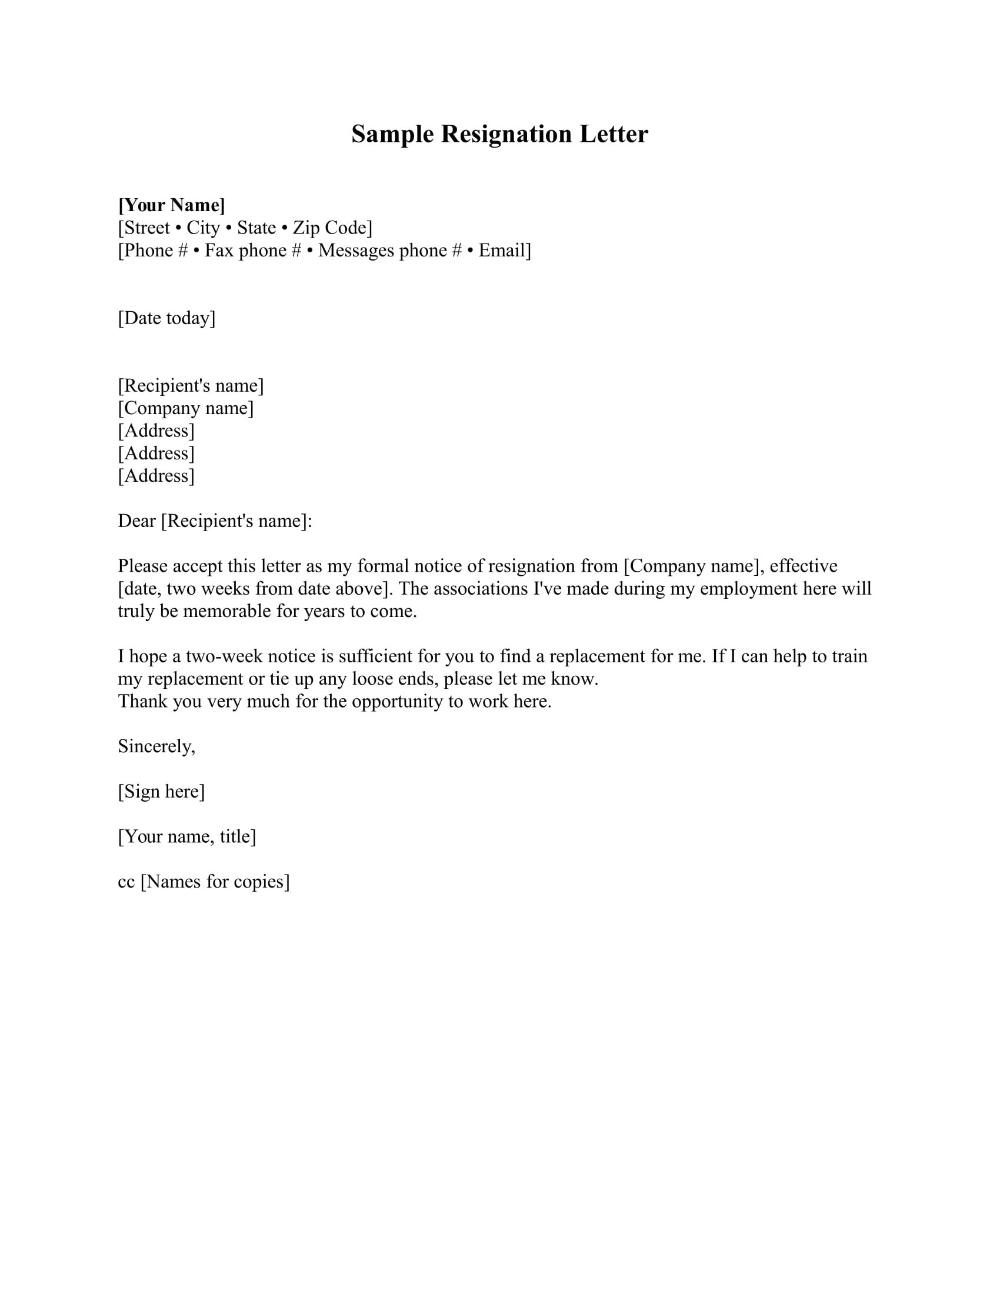 Standard Resignation Letter Examples Pdf Word Examples With Standard Resignation Letter Resignation Letter Sample Resignation Letter Resignation Letter Format